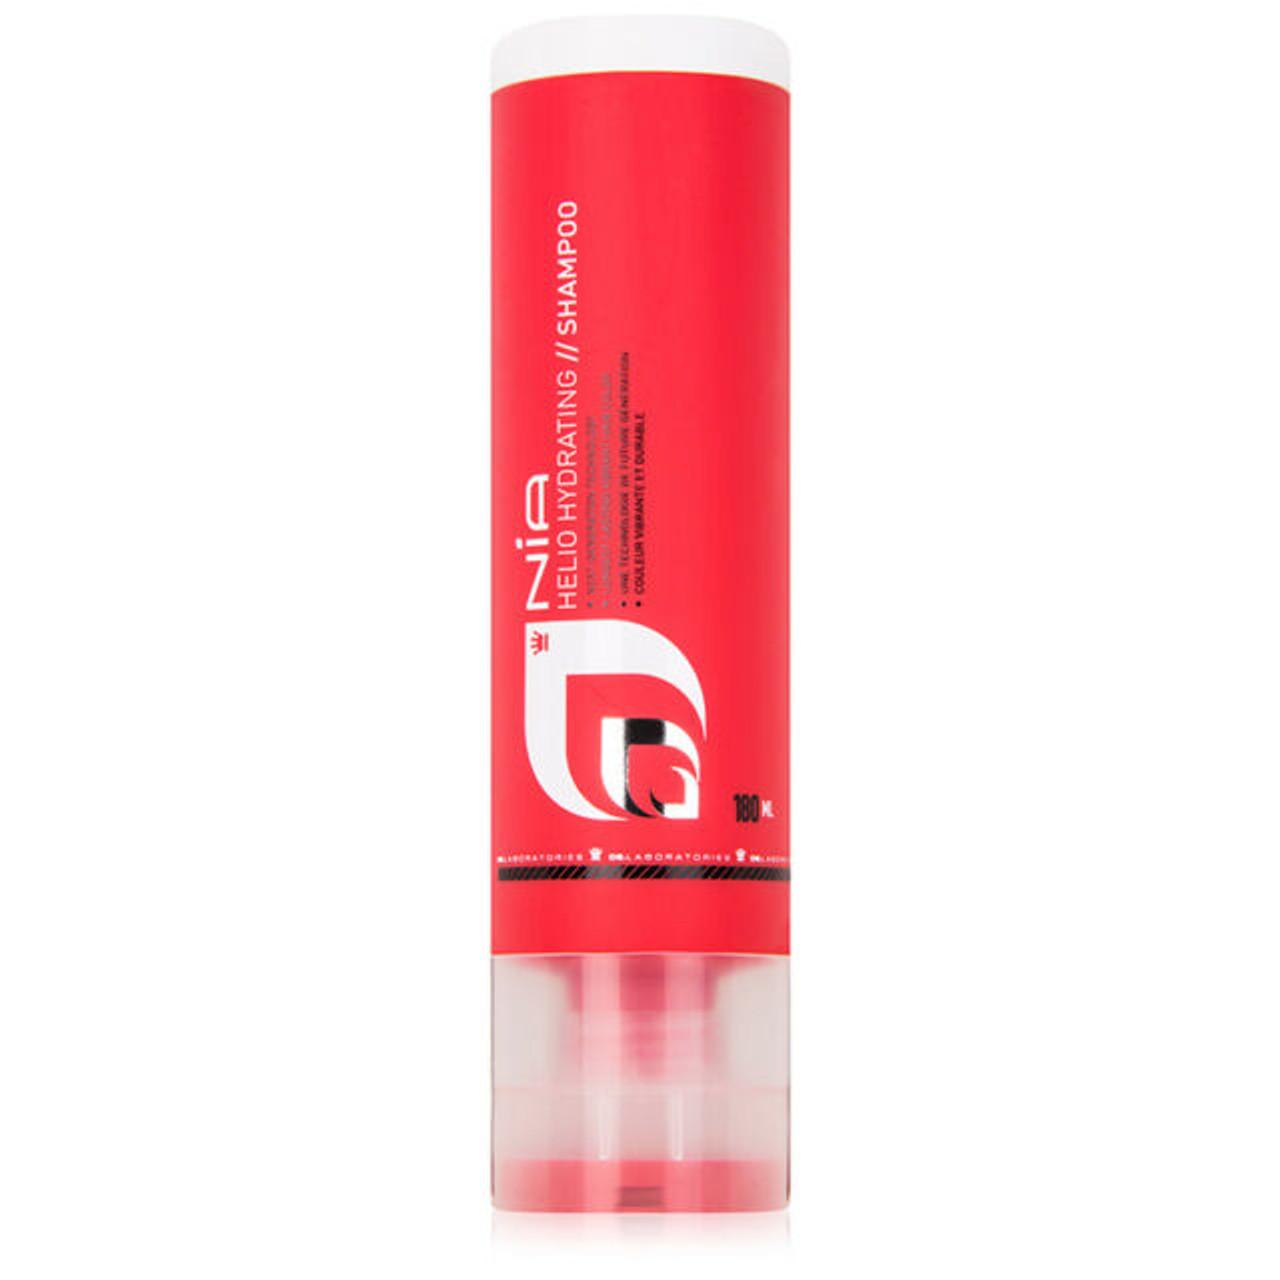 DS Labs Nia Shampoo 6 oz